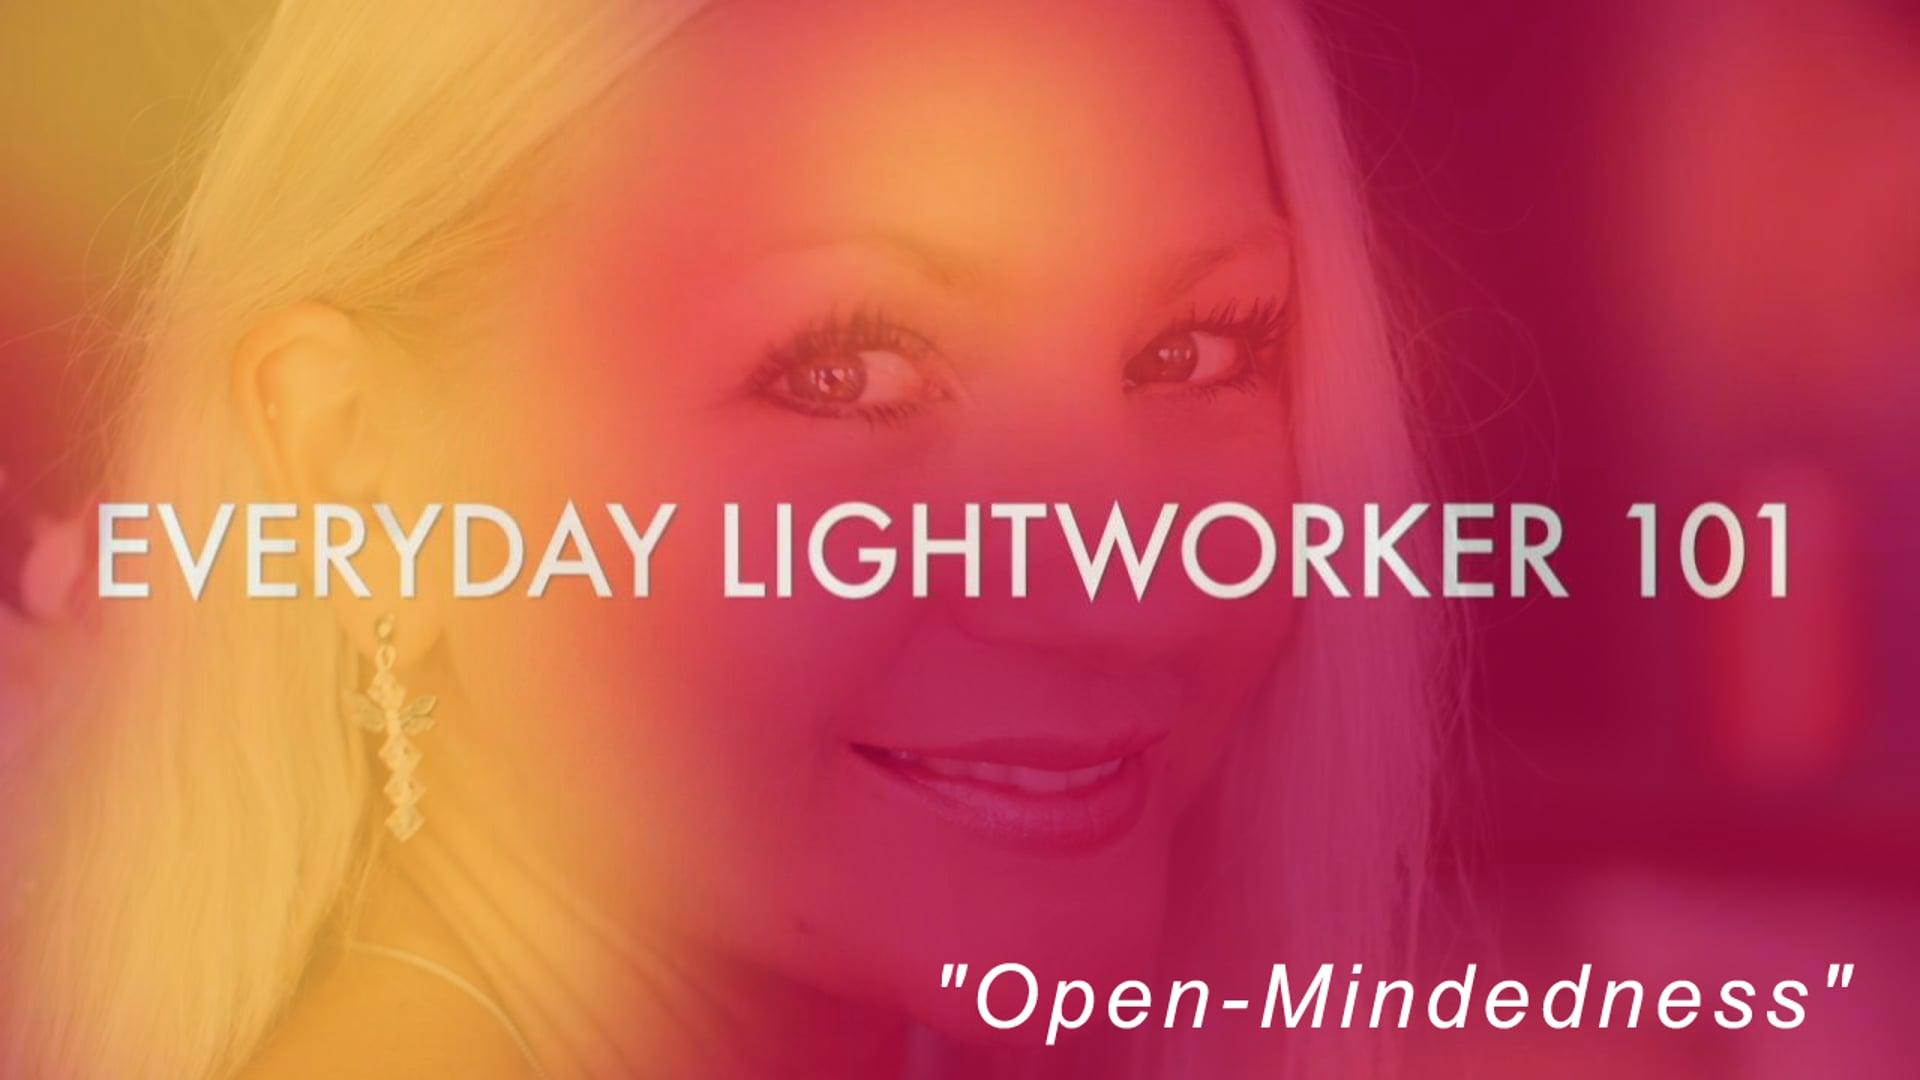 Everyday Lightworker 101: Open-Mindedness